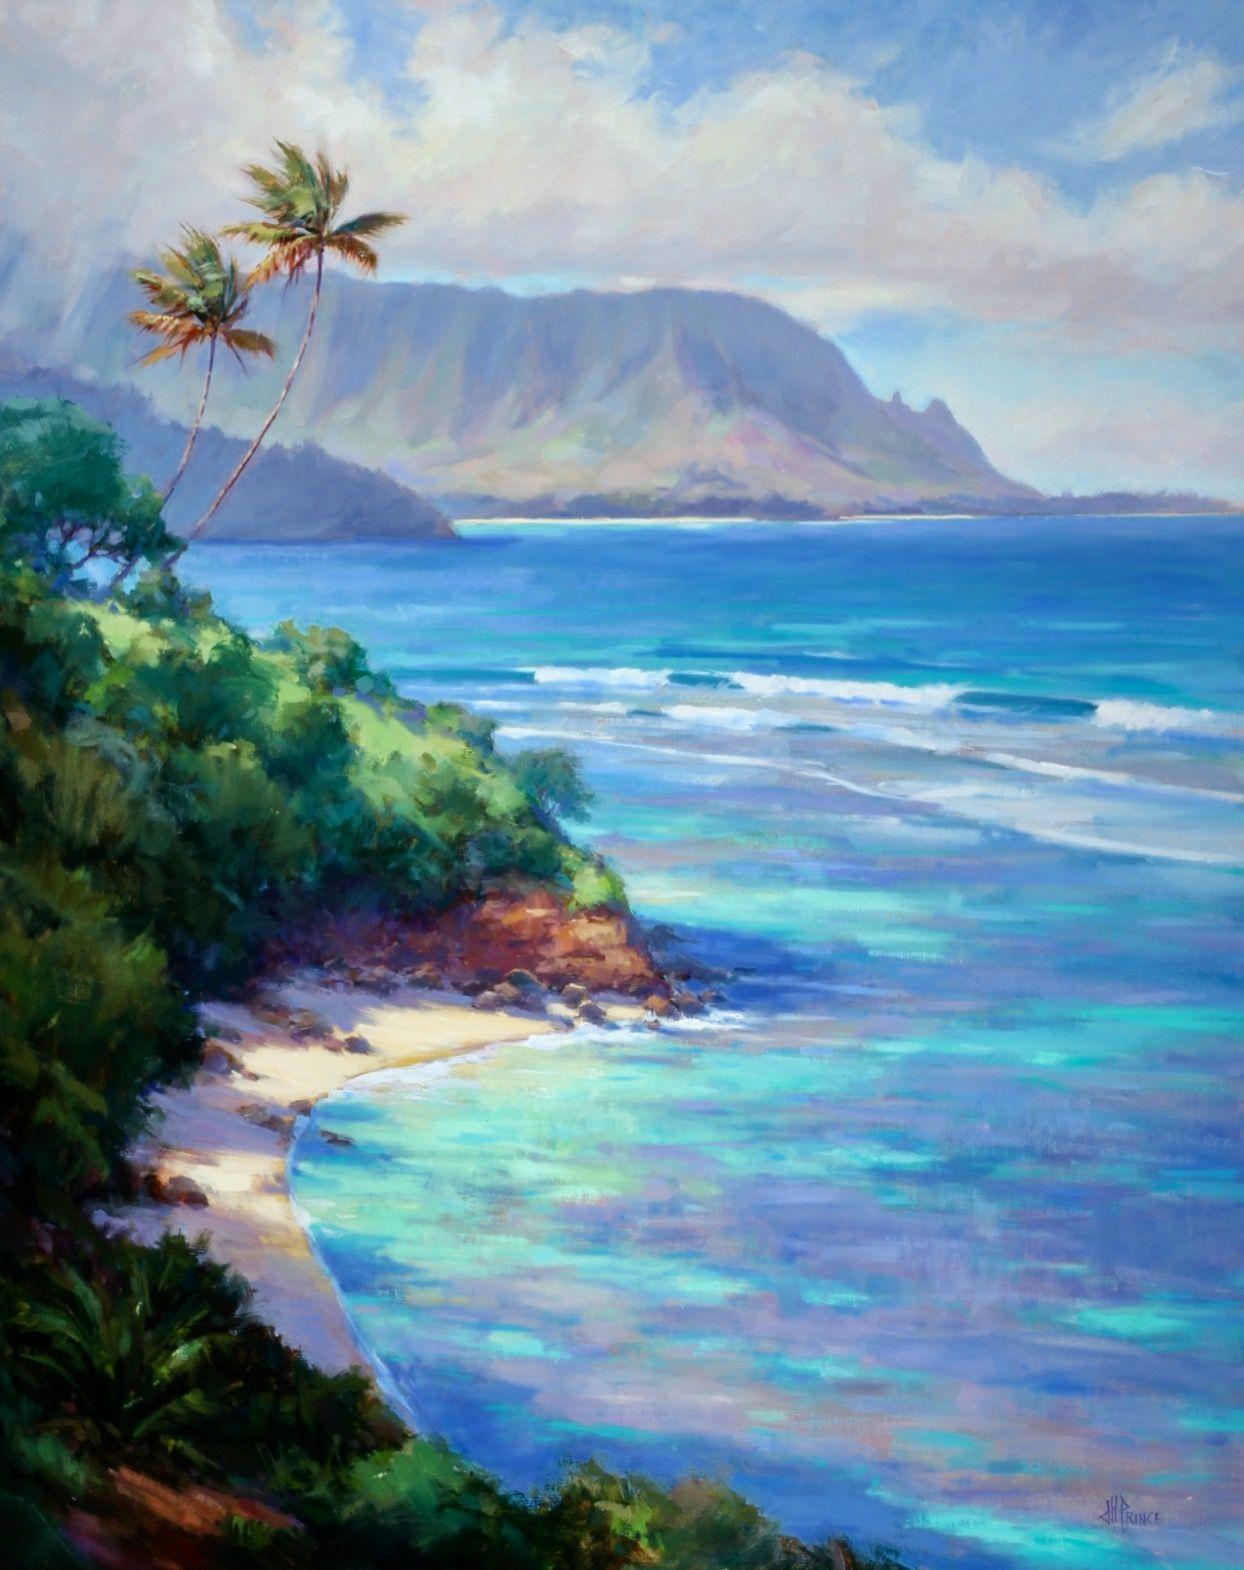 Hawaii Oil Painting Pali Ke Kua Hawaii Painting Hawaii Art Landscape Paintings